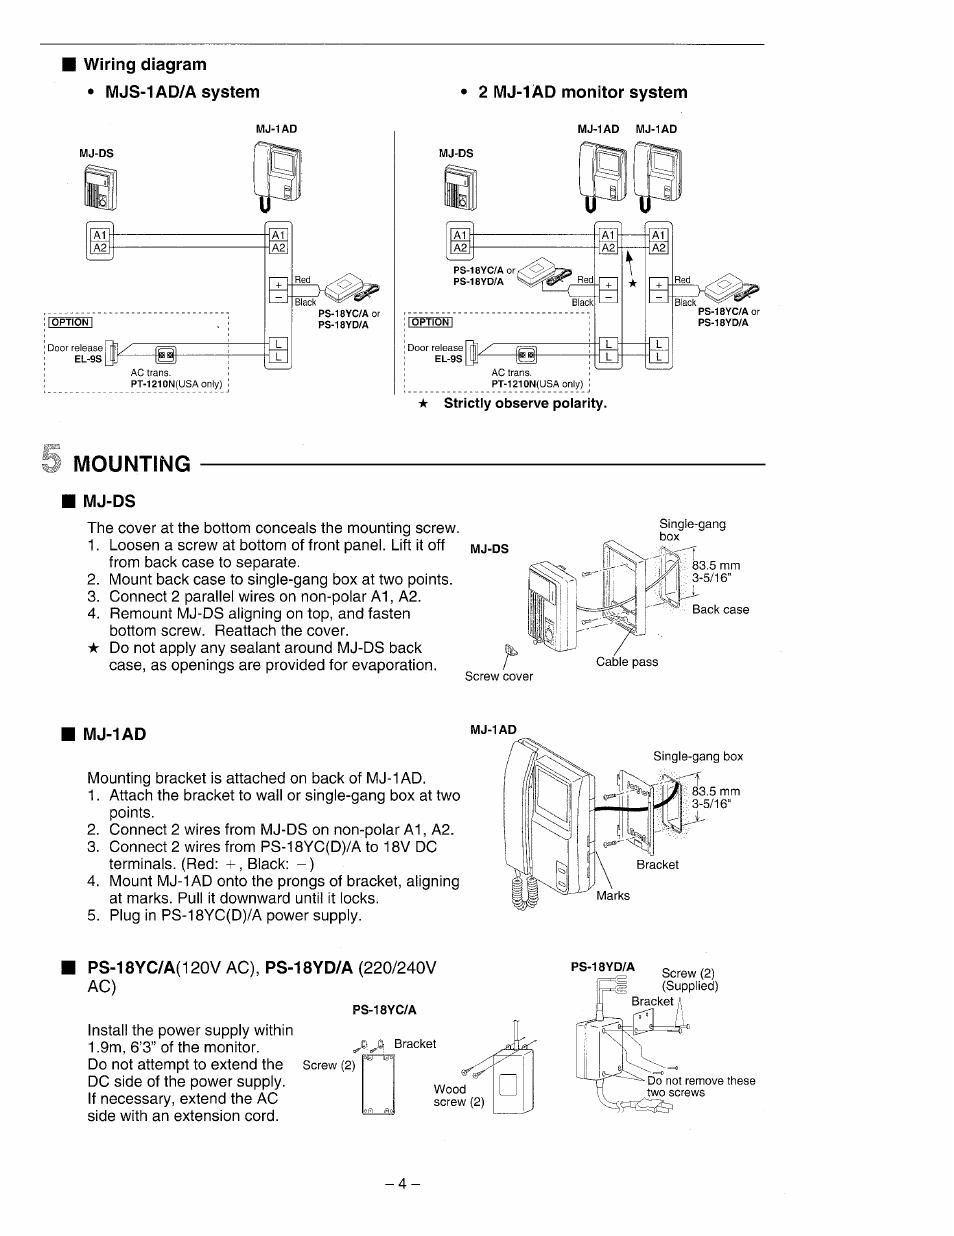 Wiring Diagram  U2022 Mjs A System  Mounting  Mj